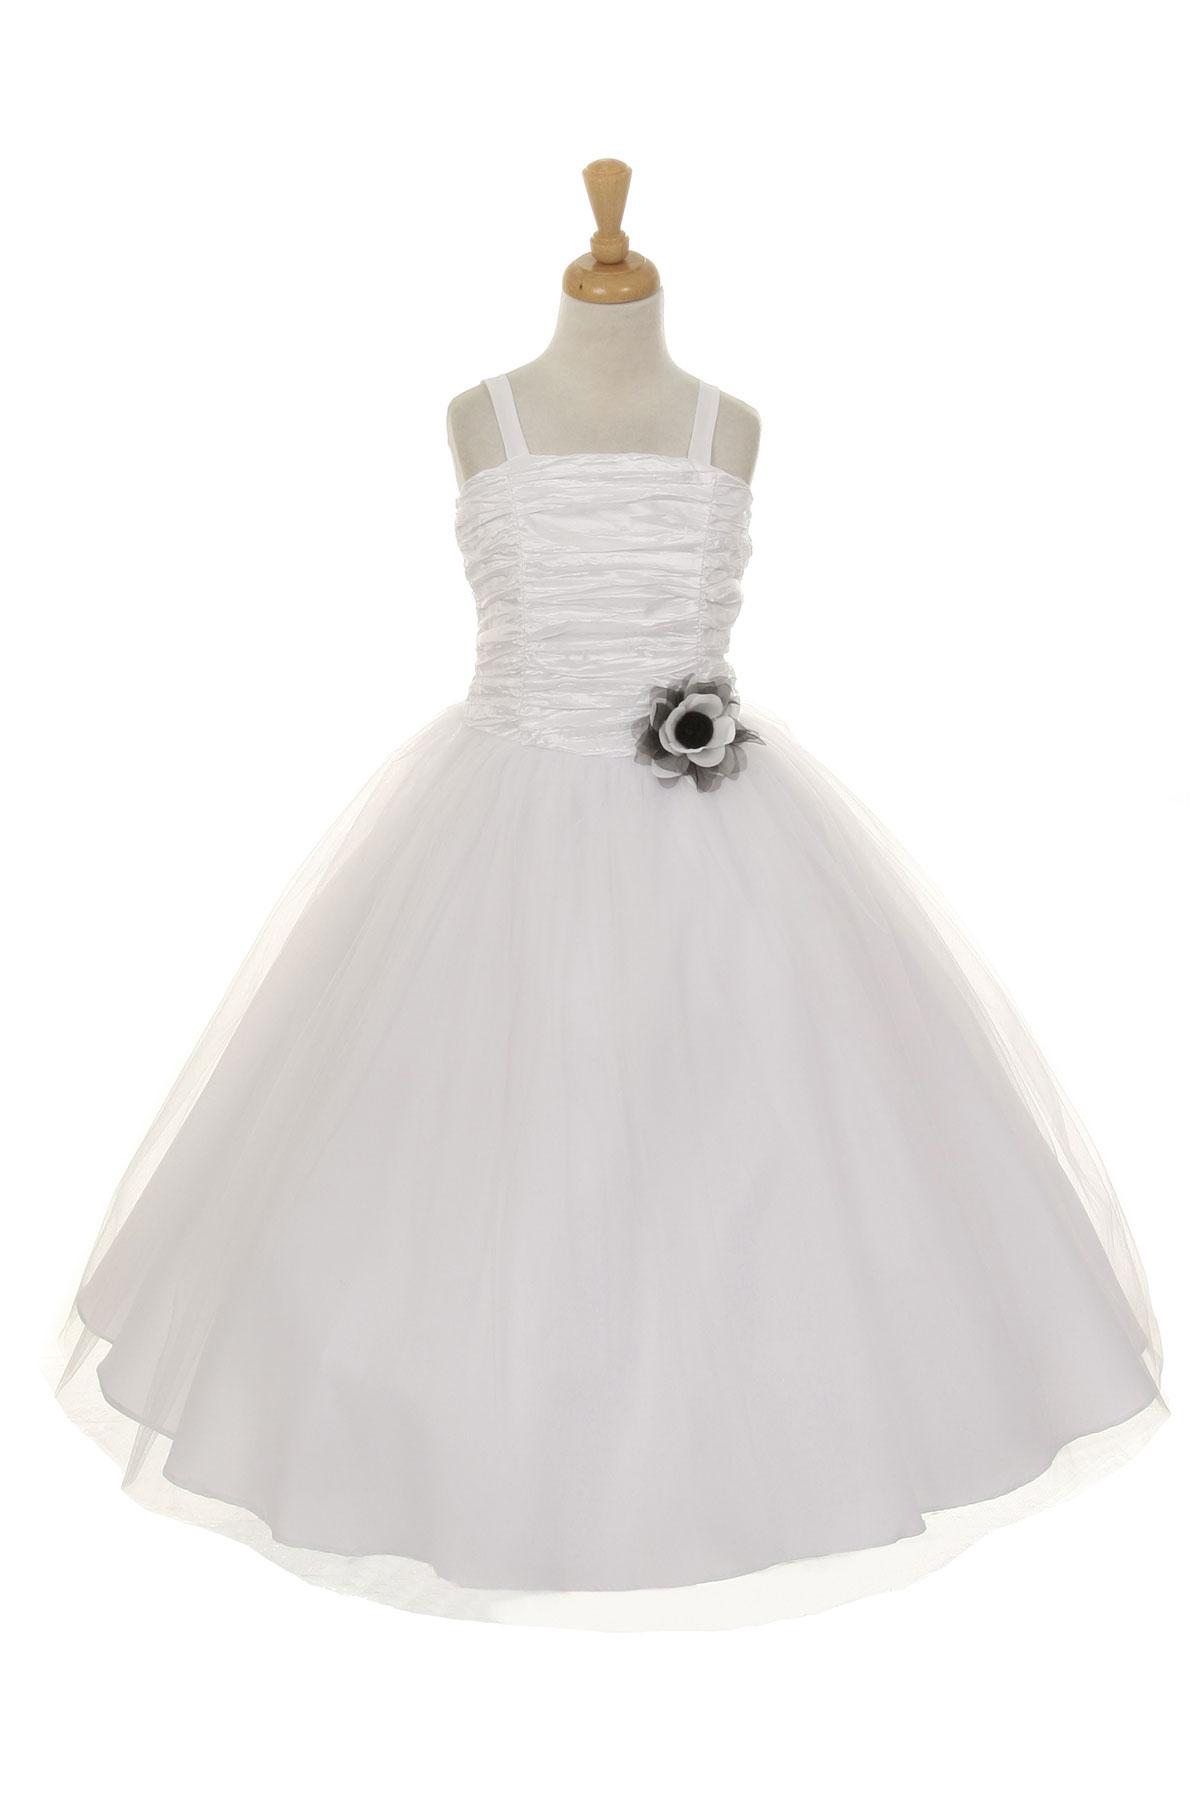 CC 4001W Girls Dress Style 4001 Spaghetti Strap Dress with Ruched Bodice